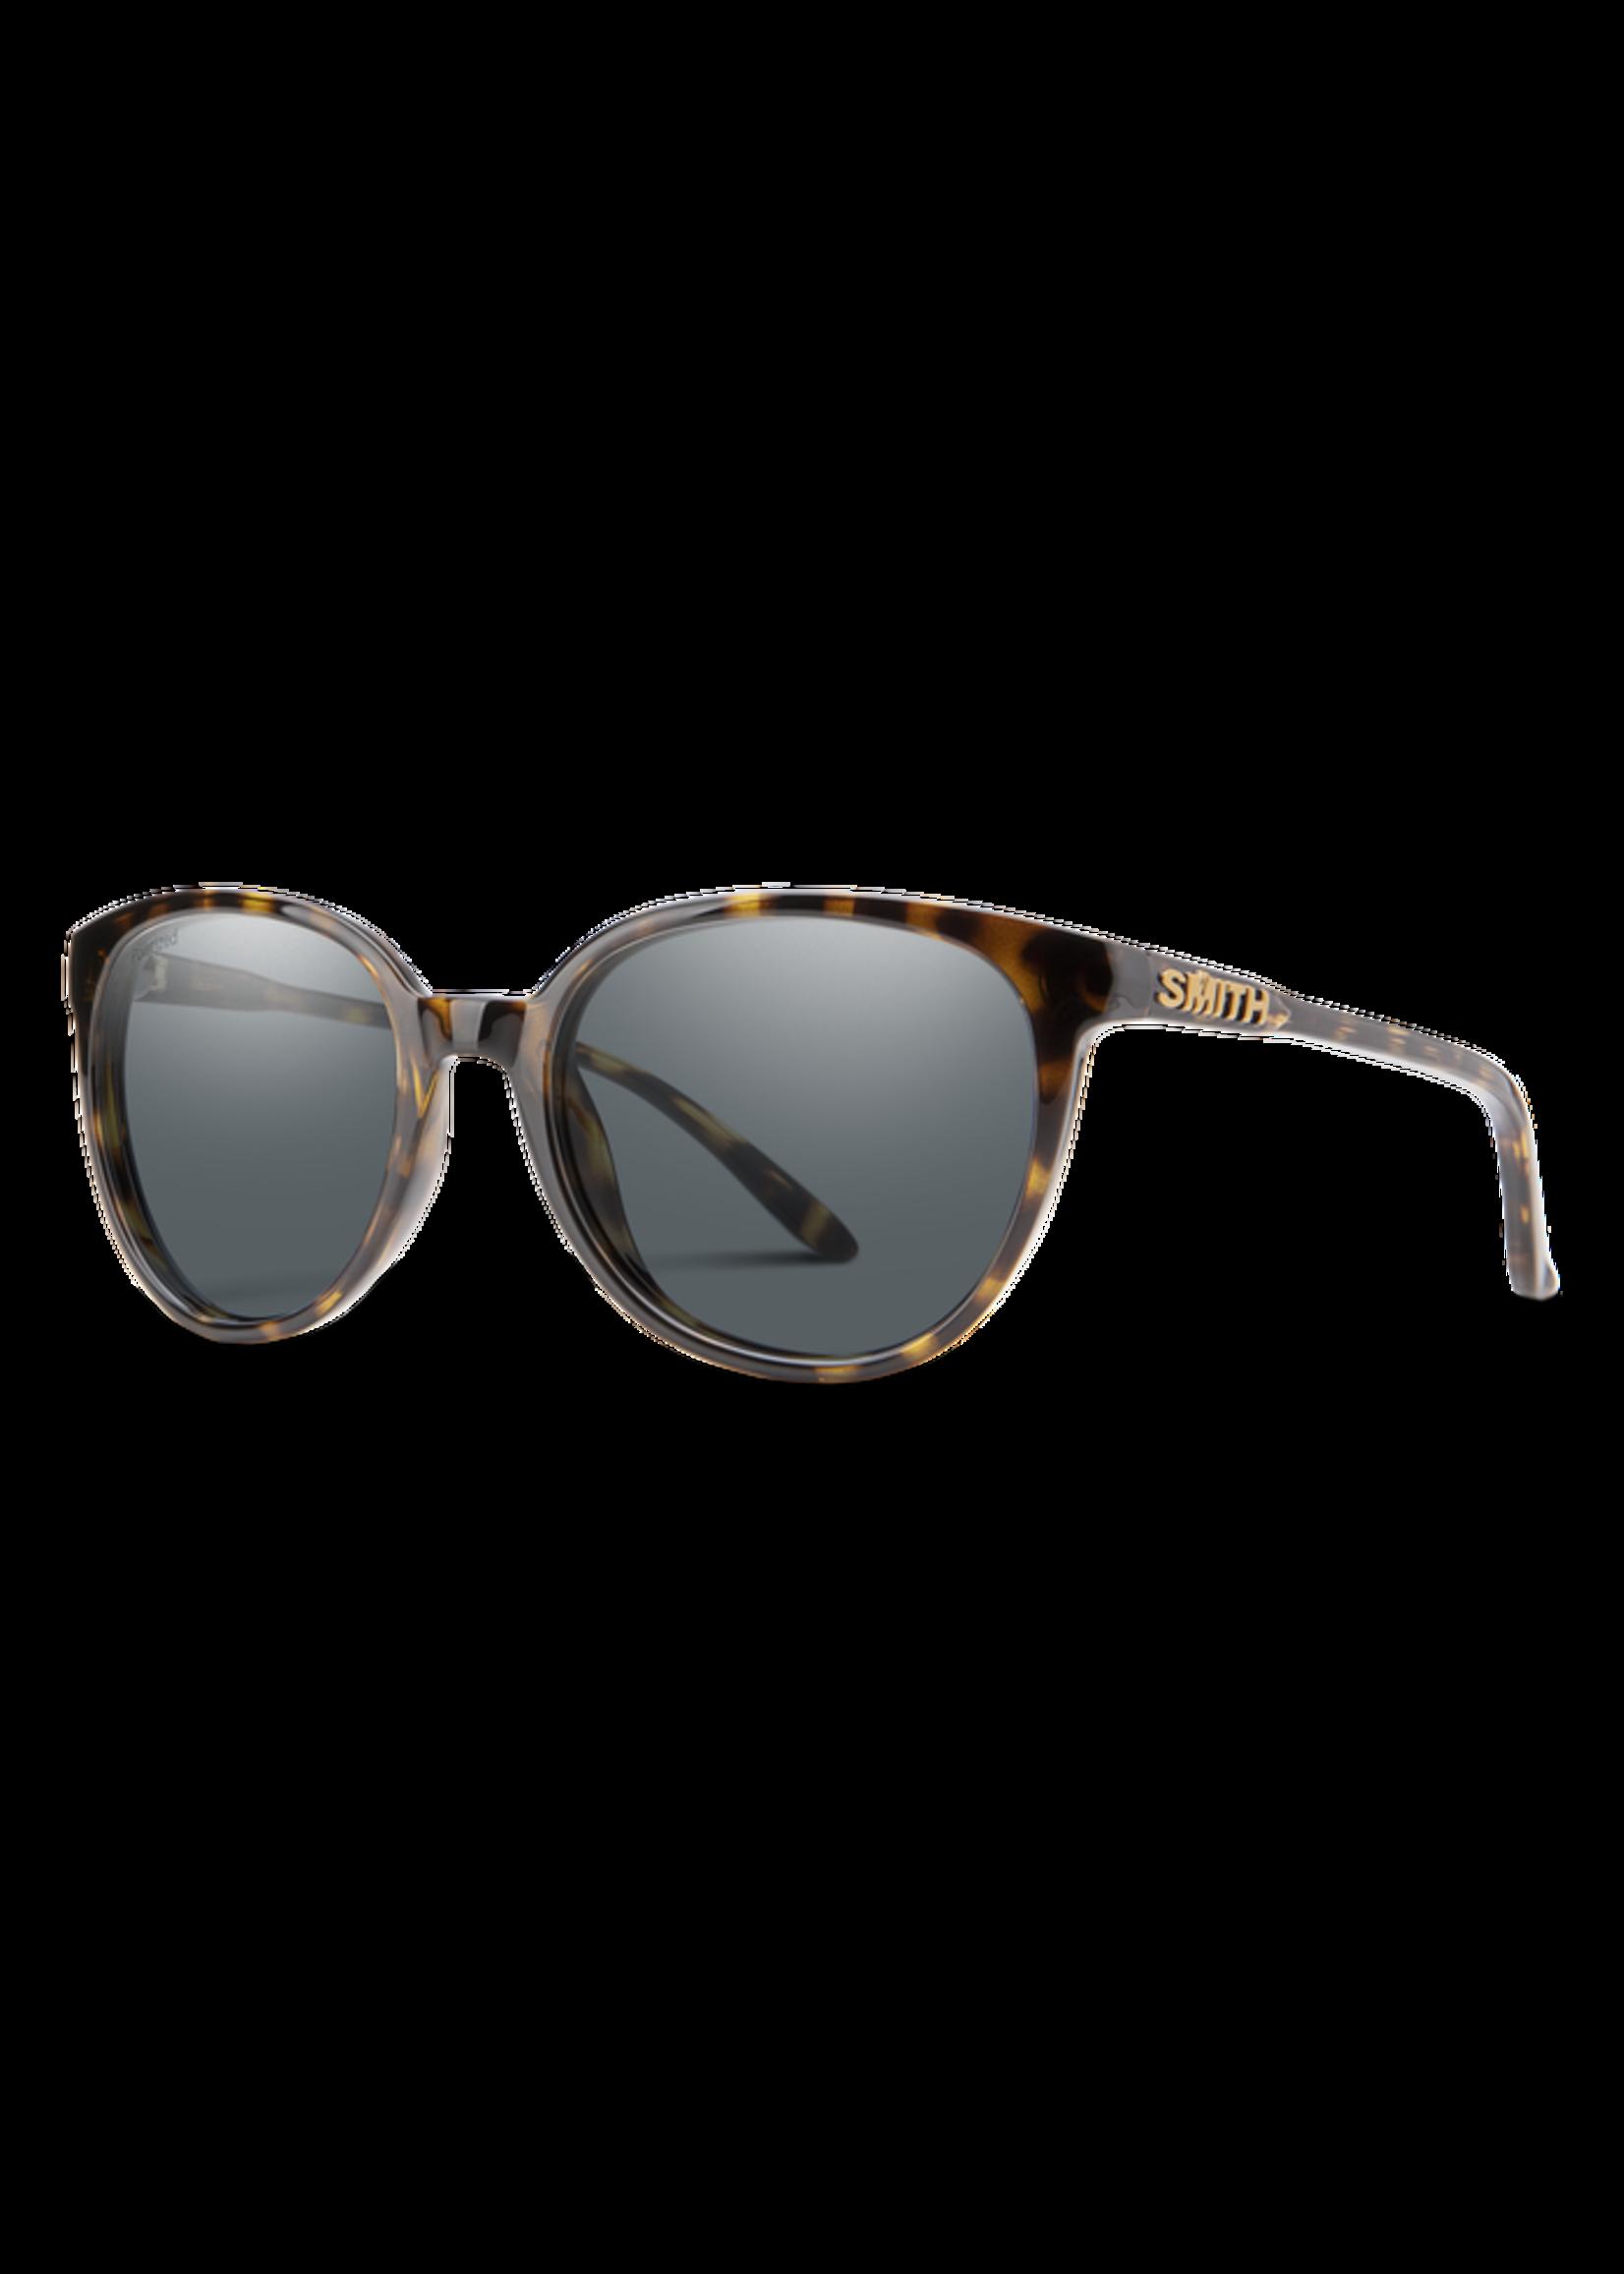 smith Smith Cheetah Sunglasses